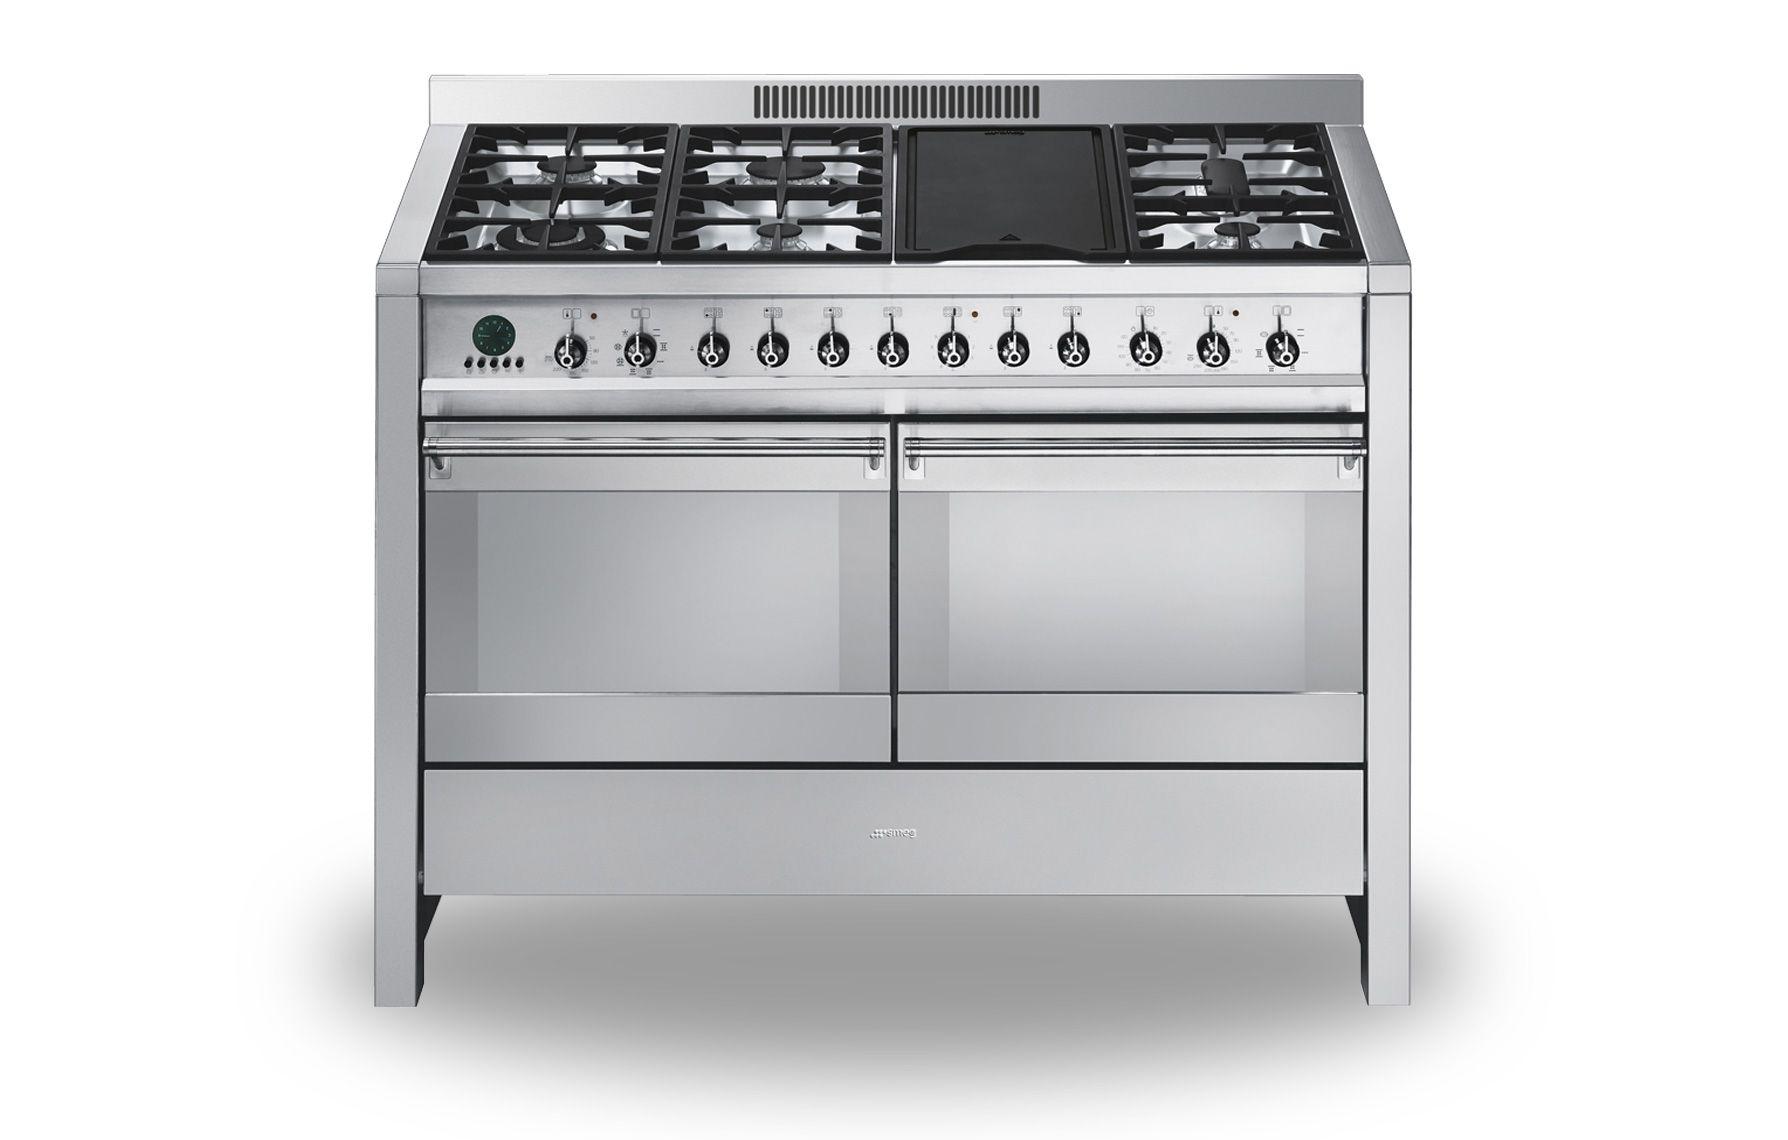 Freestanding Range Cookers Uk Part - 45: Smeg A4 Opera 120 Range Cookers   Rangecookers.co.uk Cooker Of Dreams